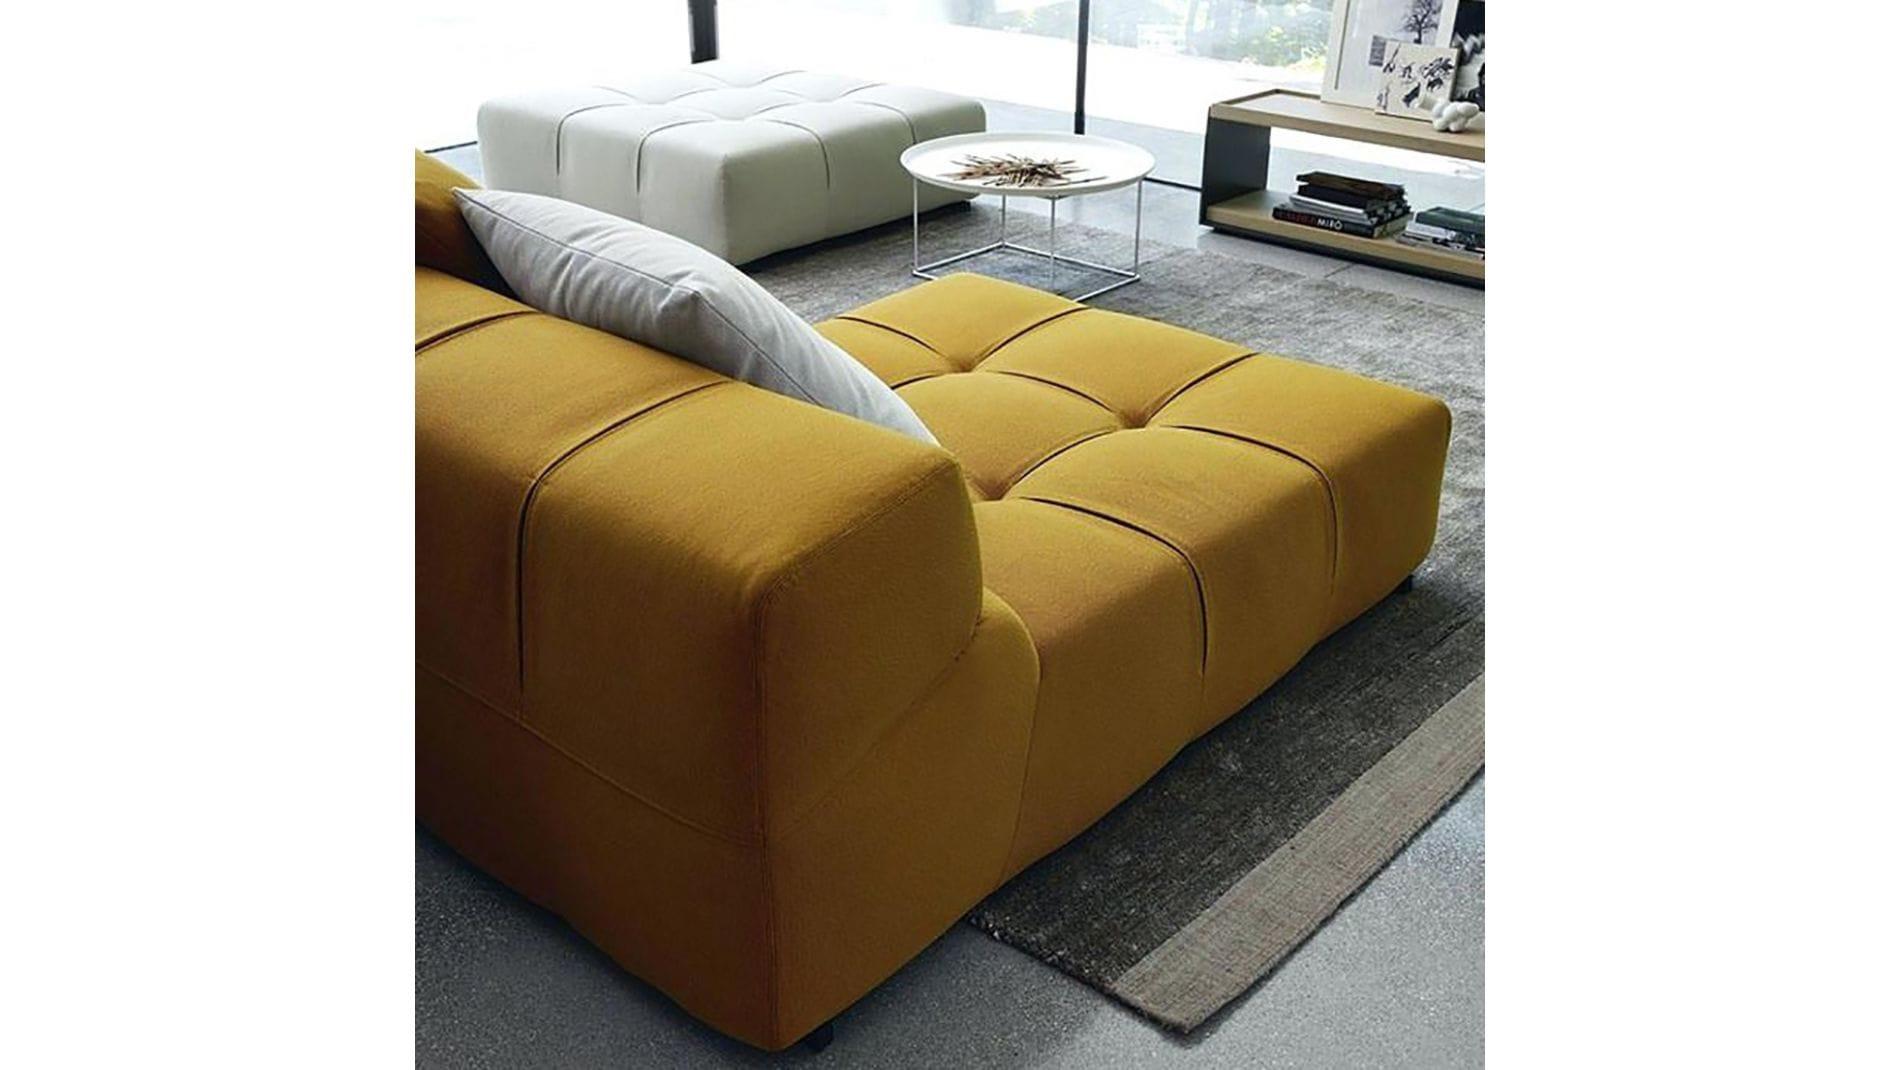 Диван Tufty-Time Sofa Серо-оранжевый Шерсть Р